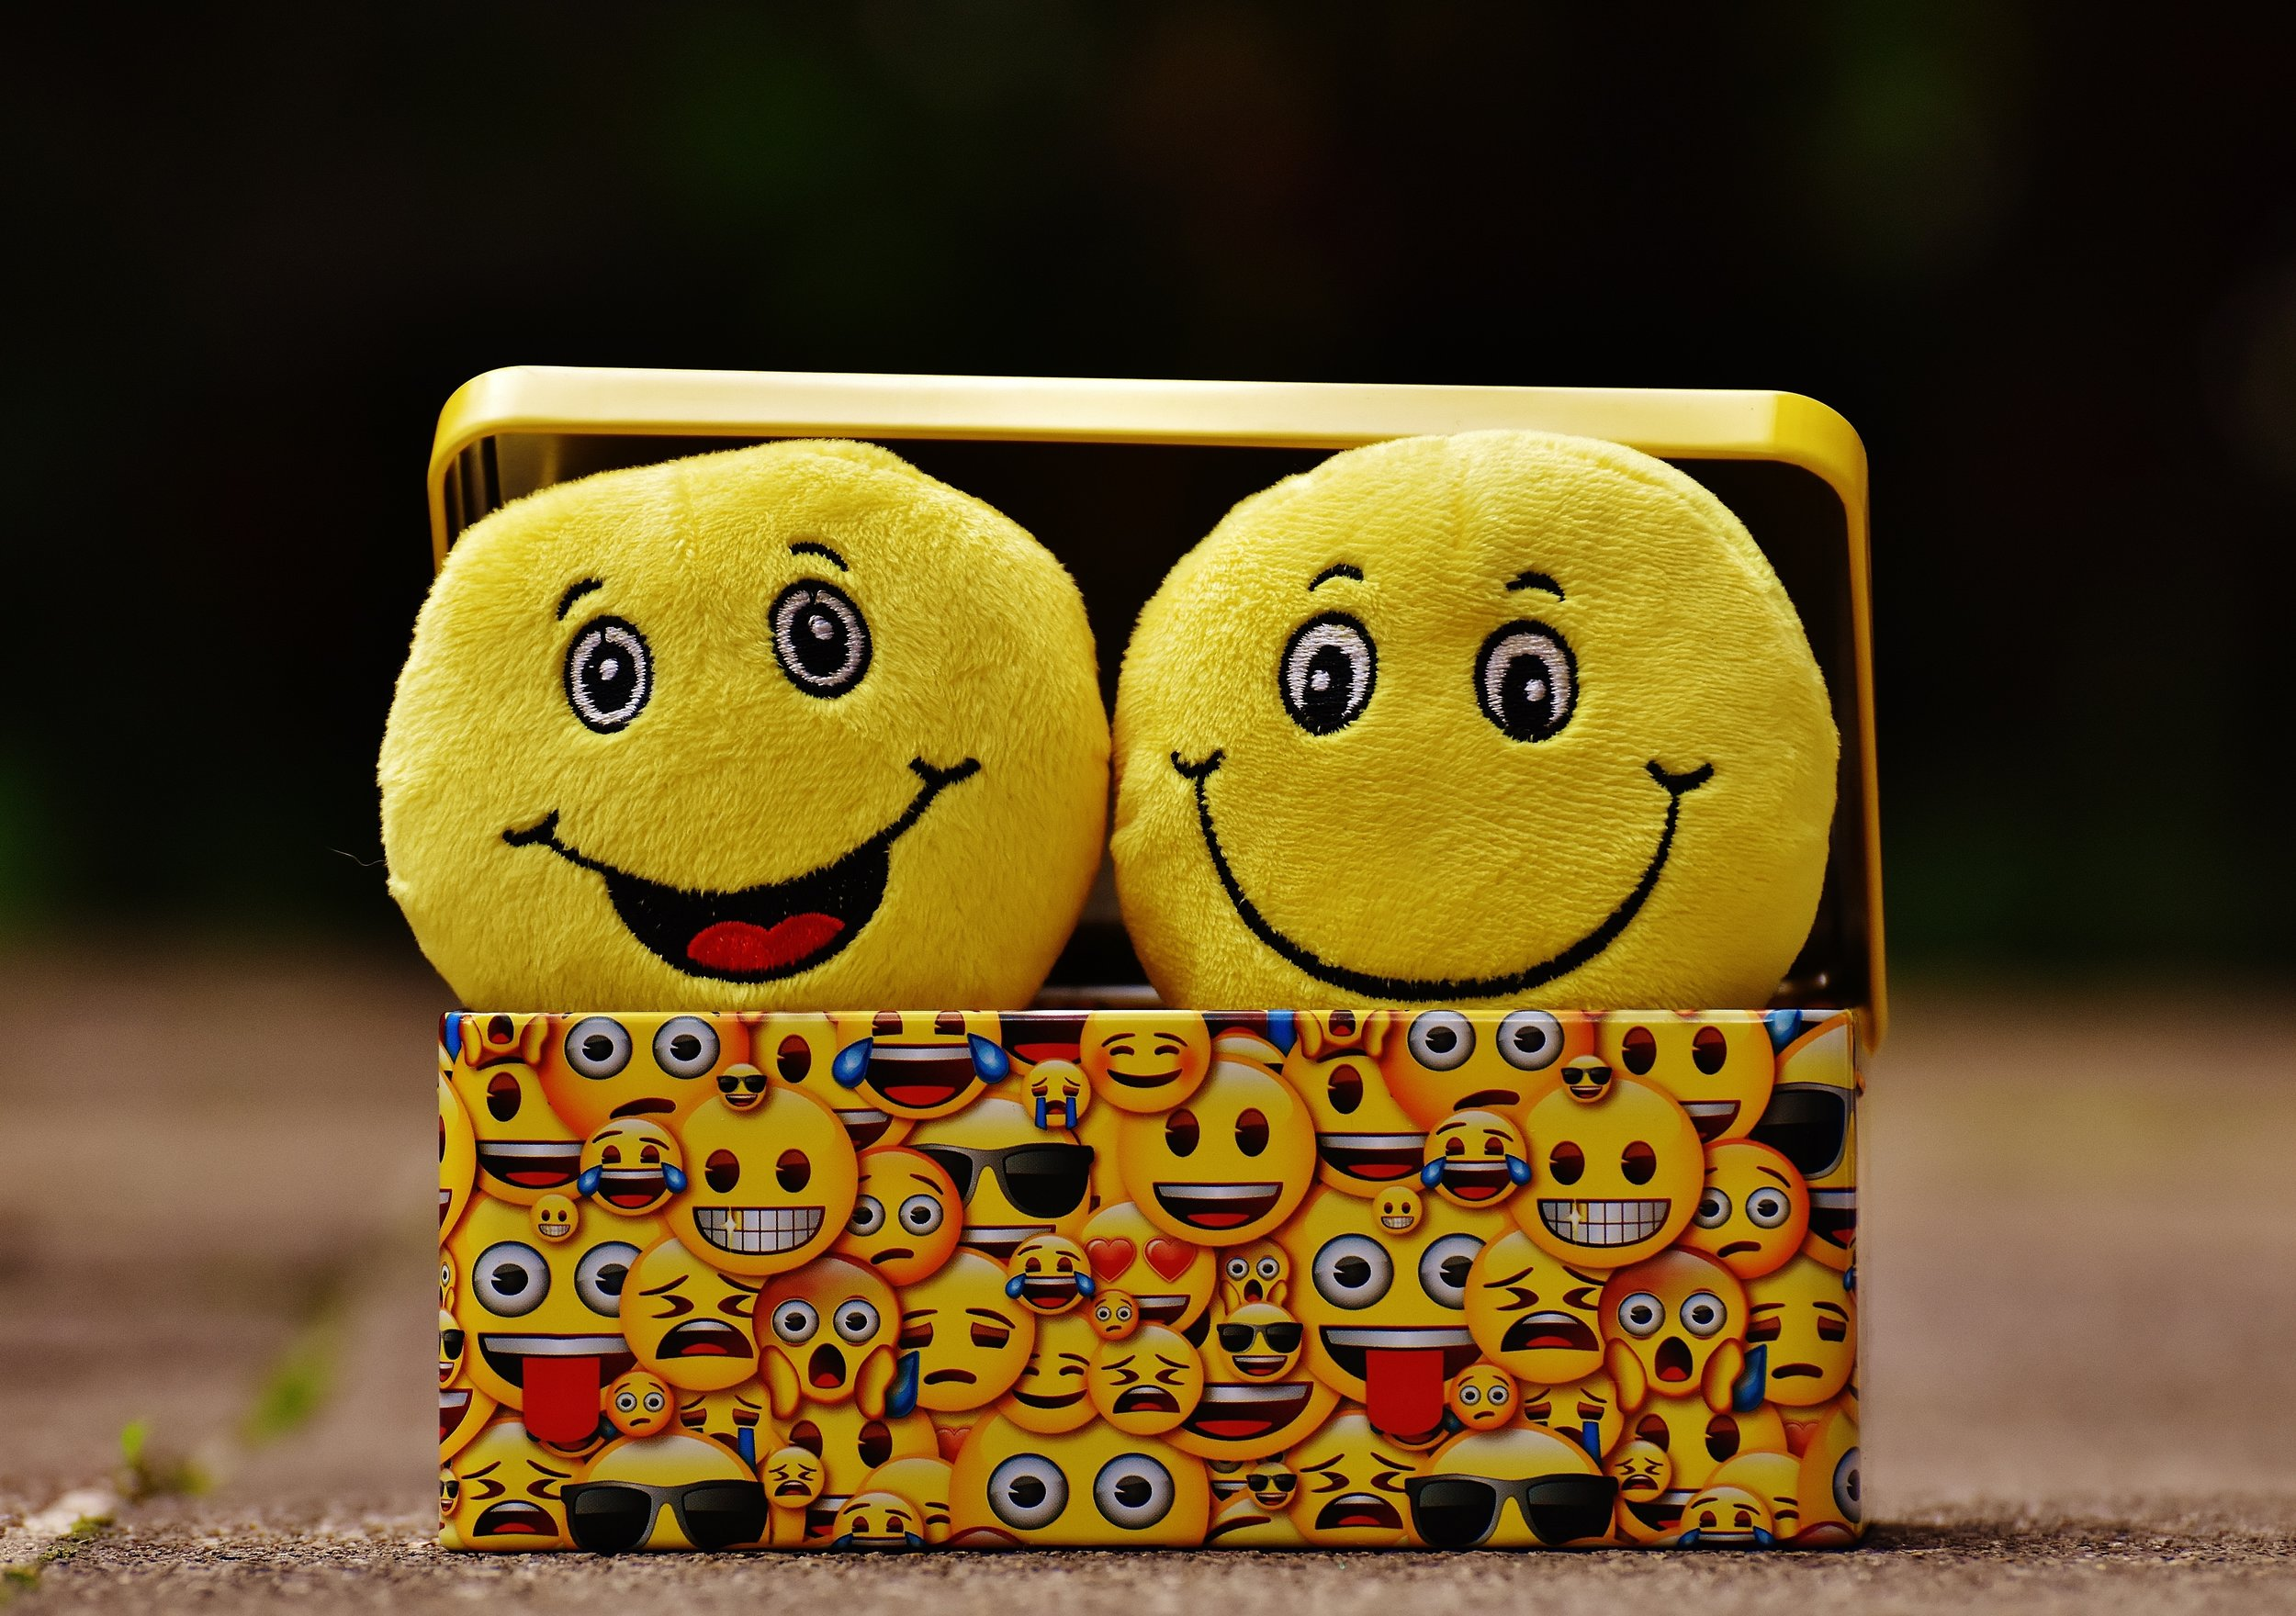 box-cheerful-color-207983.jpg